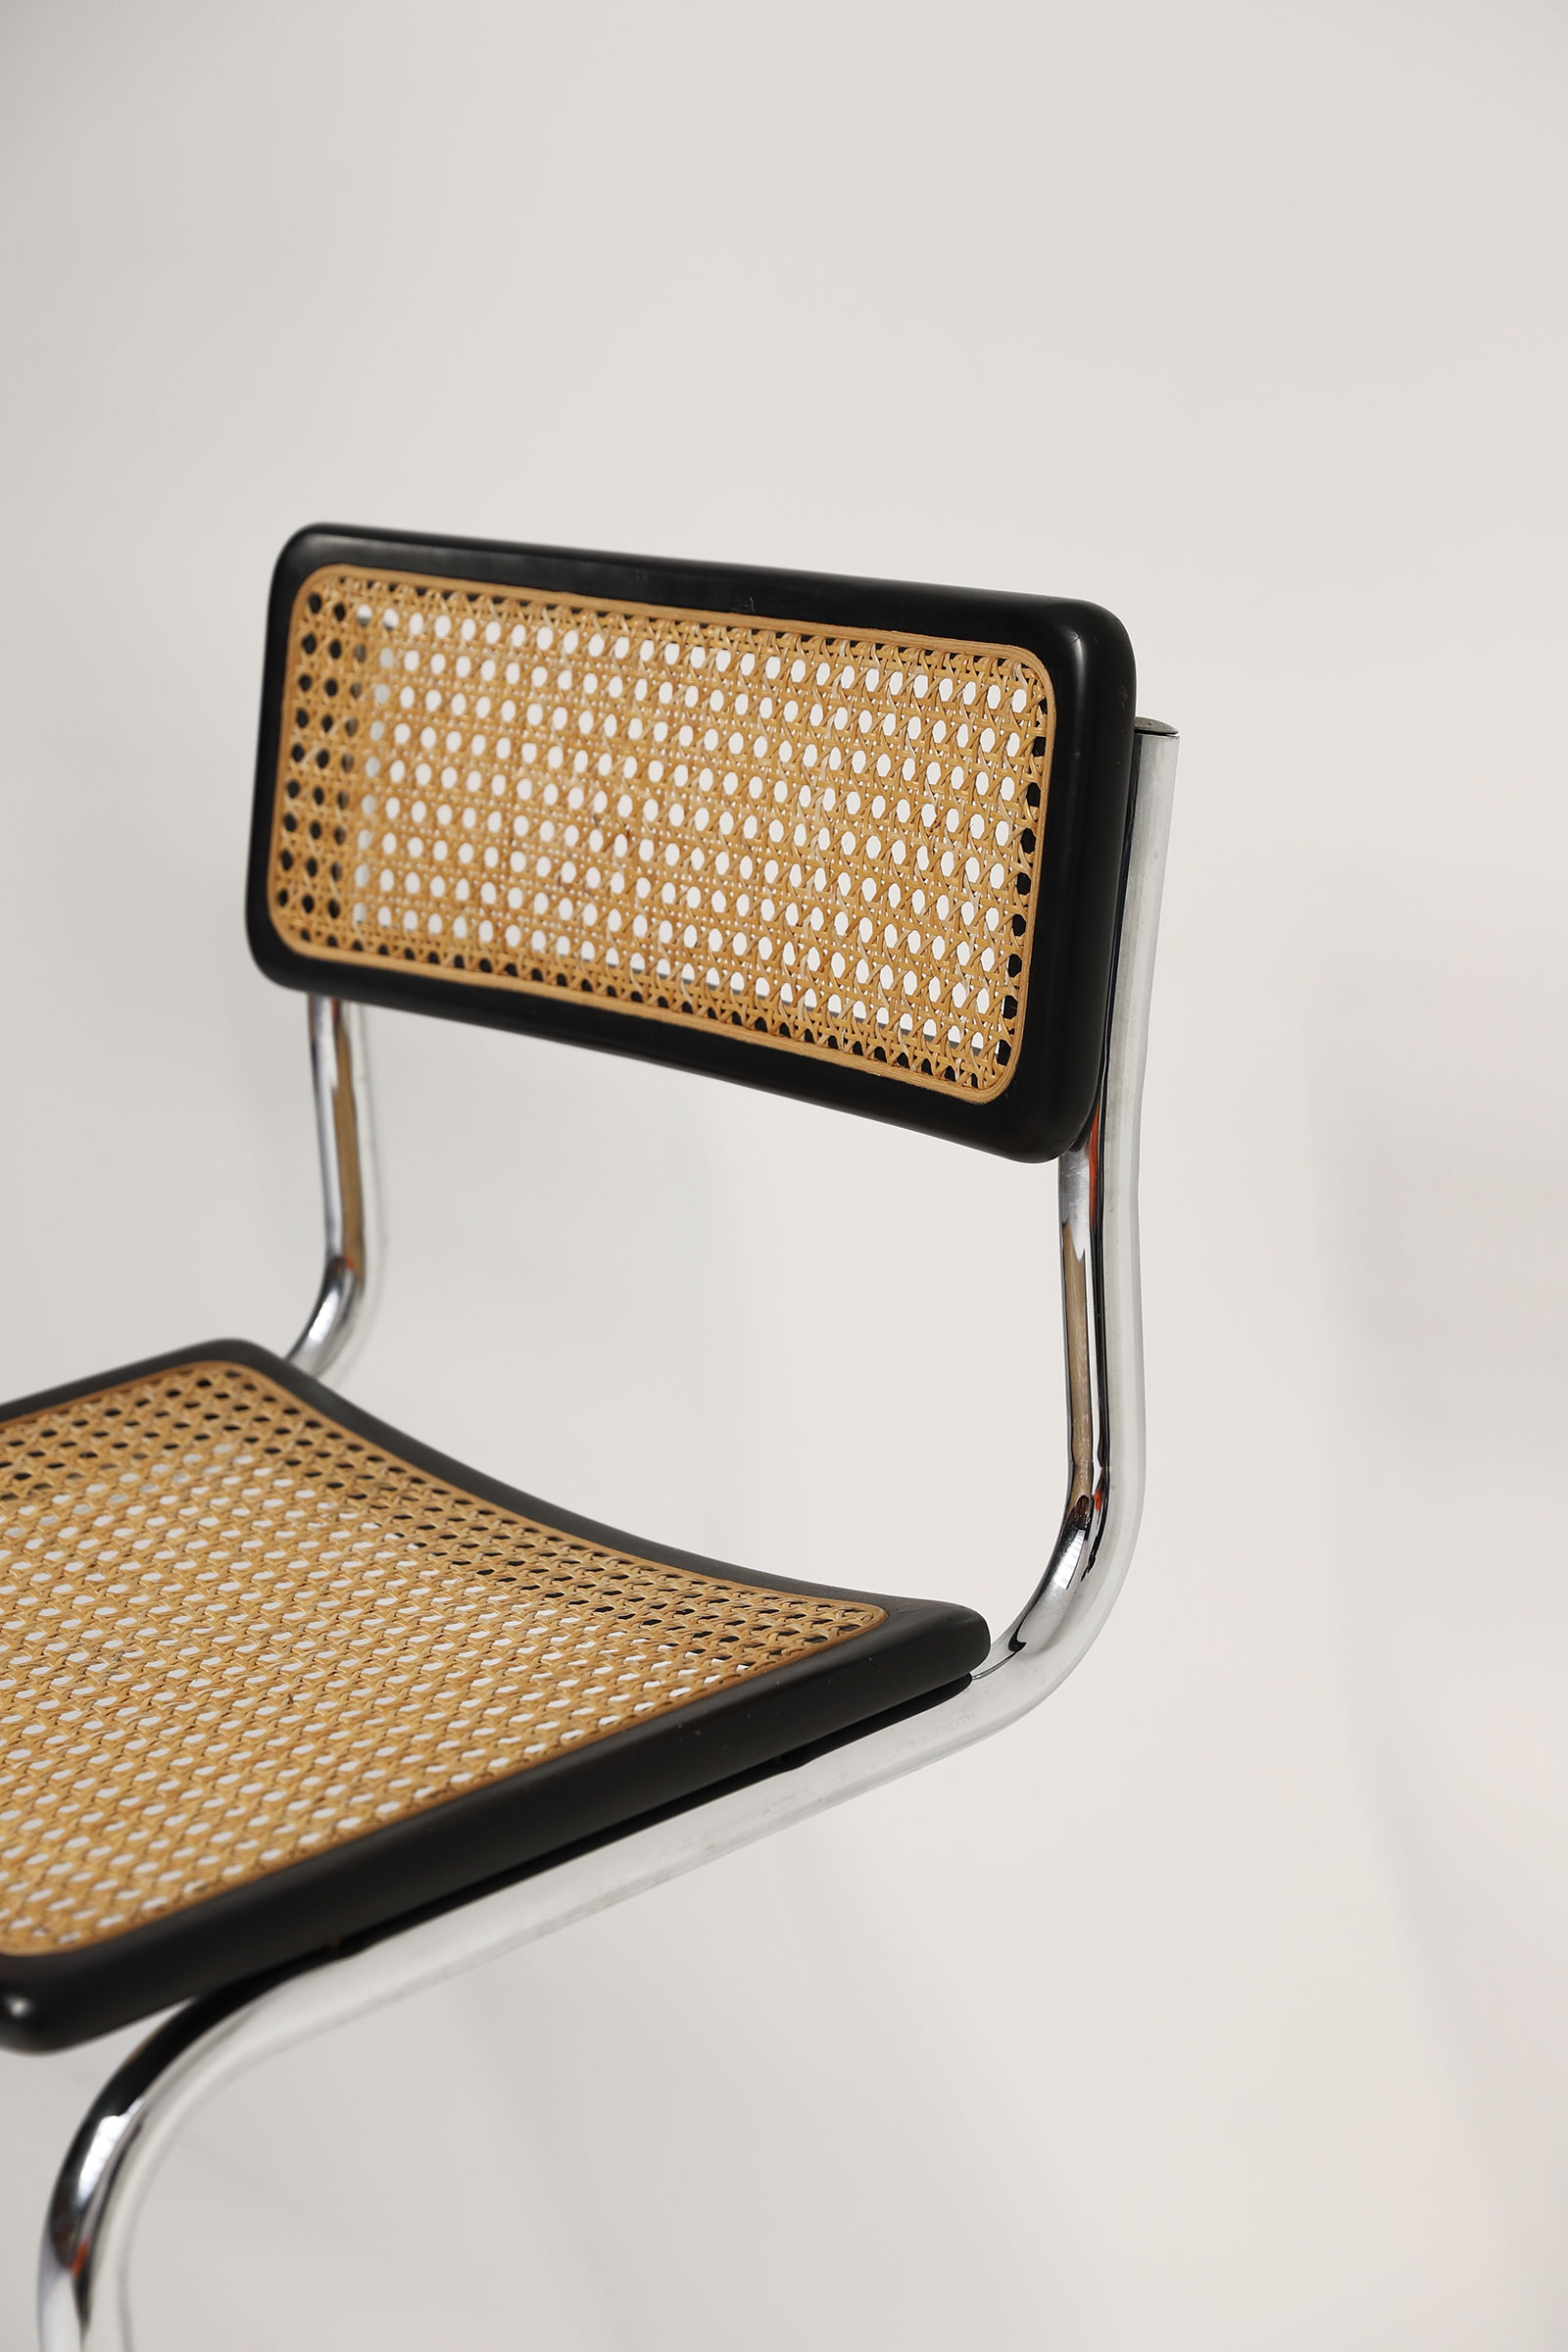 Cesca cantilever bar stools image 5